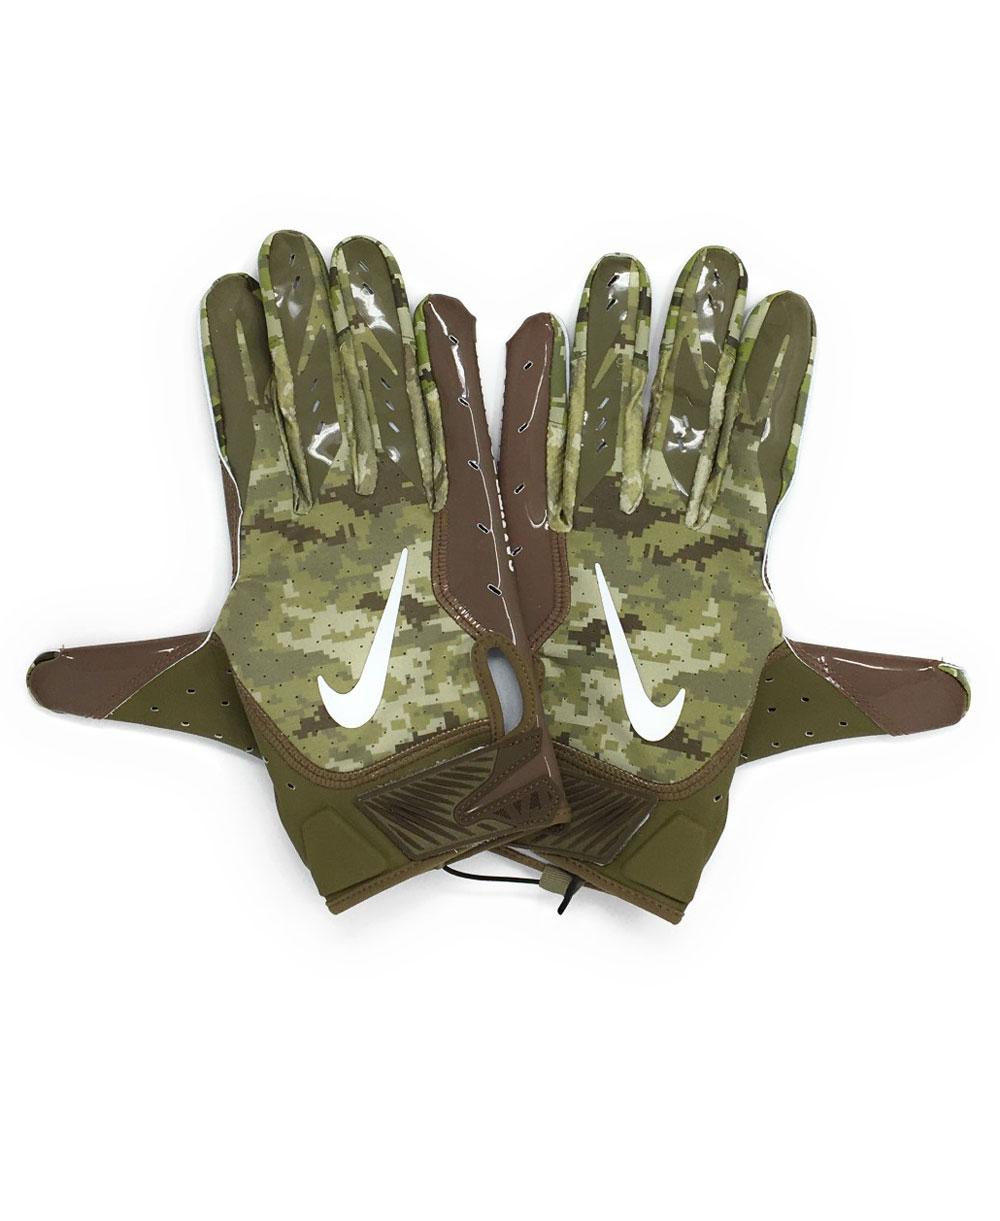 Vapor Jet 5 Salute To Service NFL Guantes Fútbol Americano para Hombre Trooper/Brown